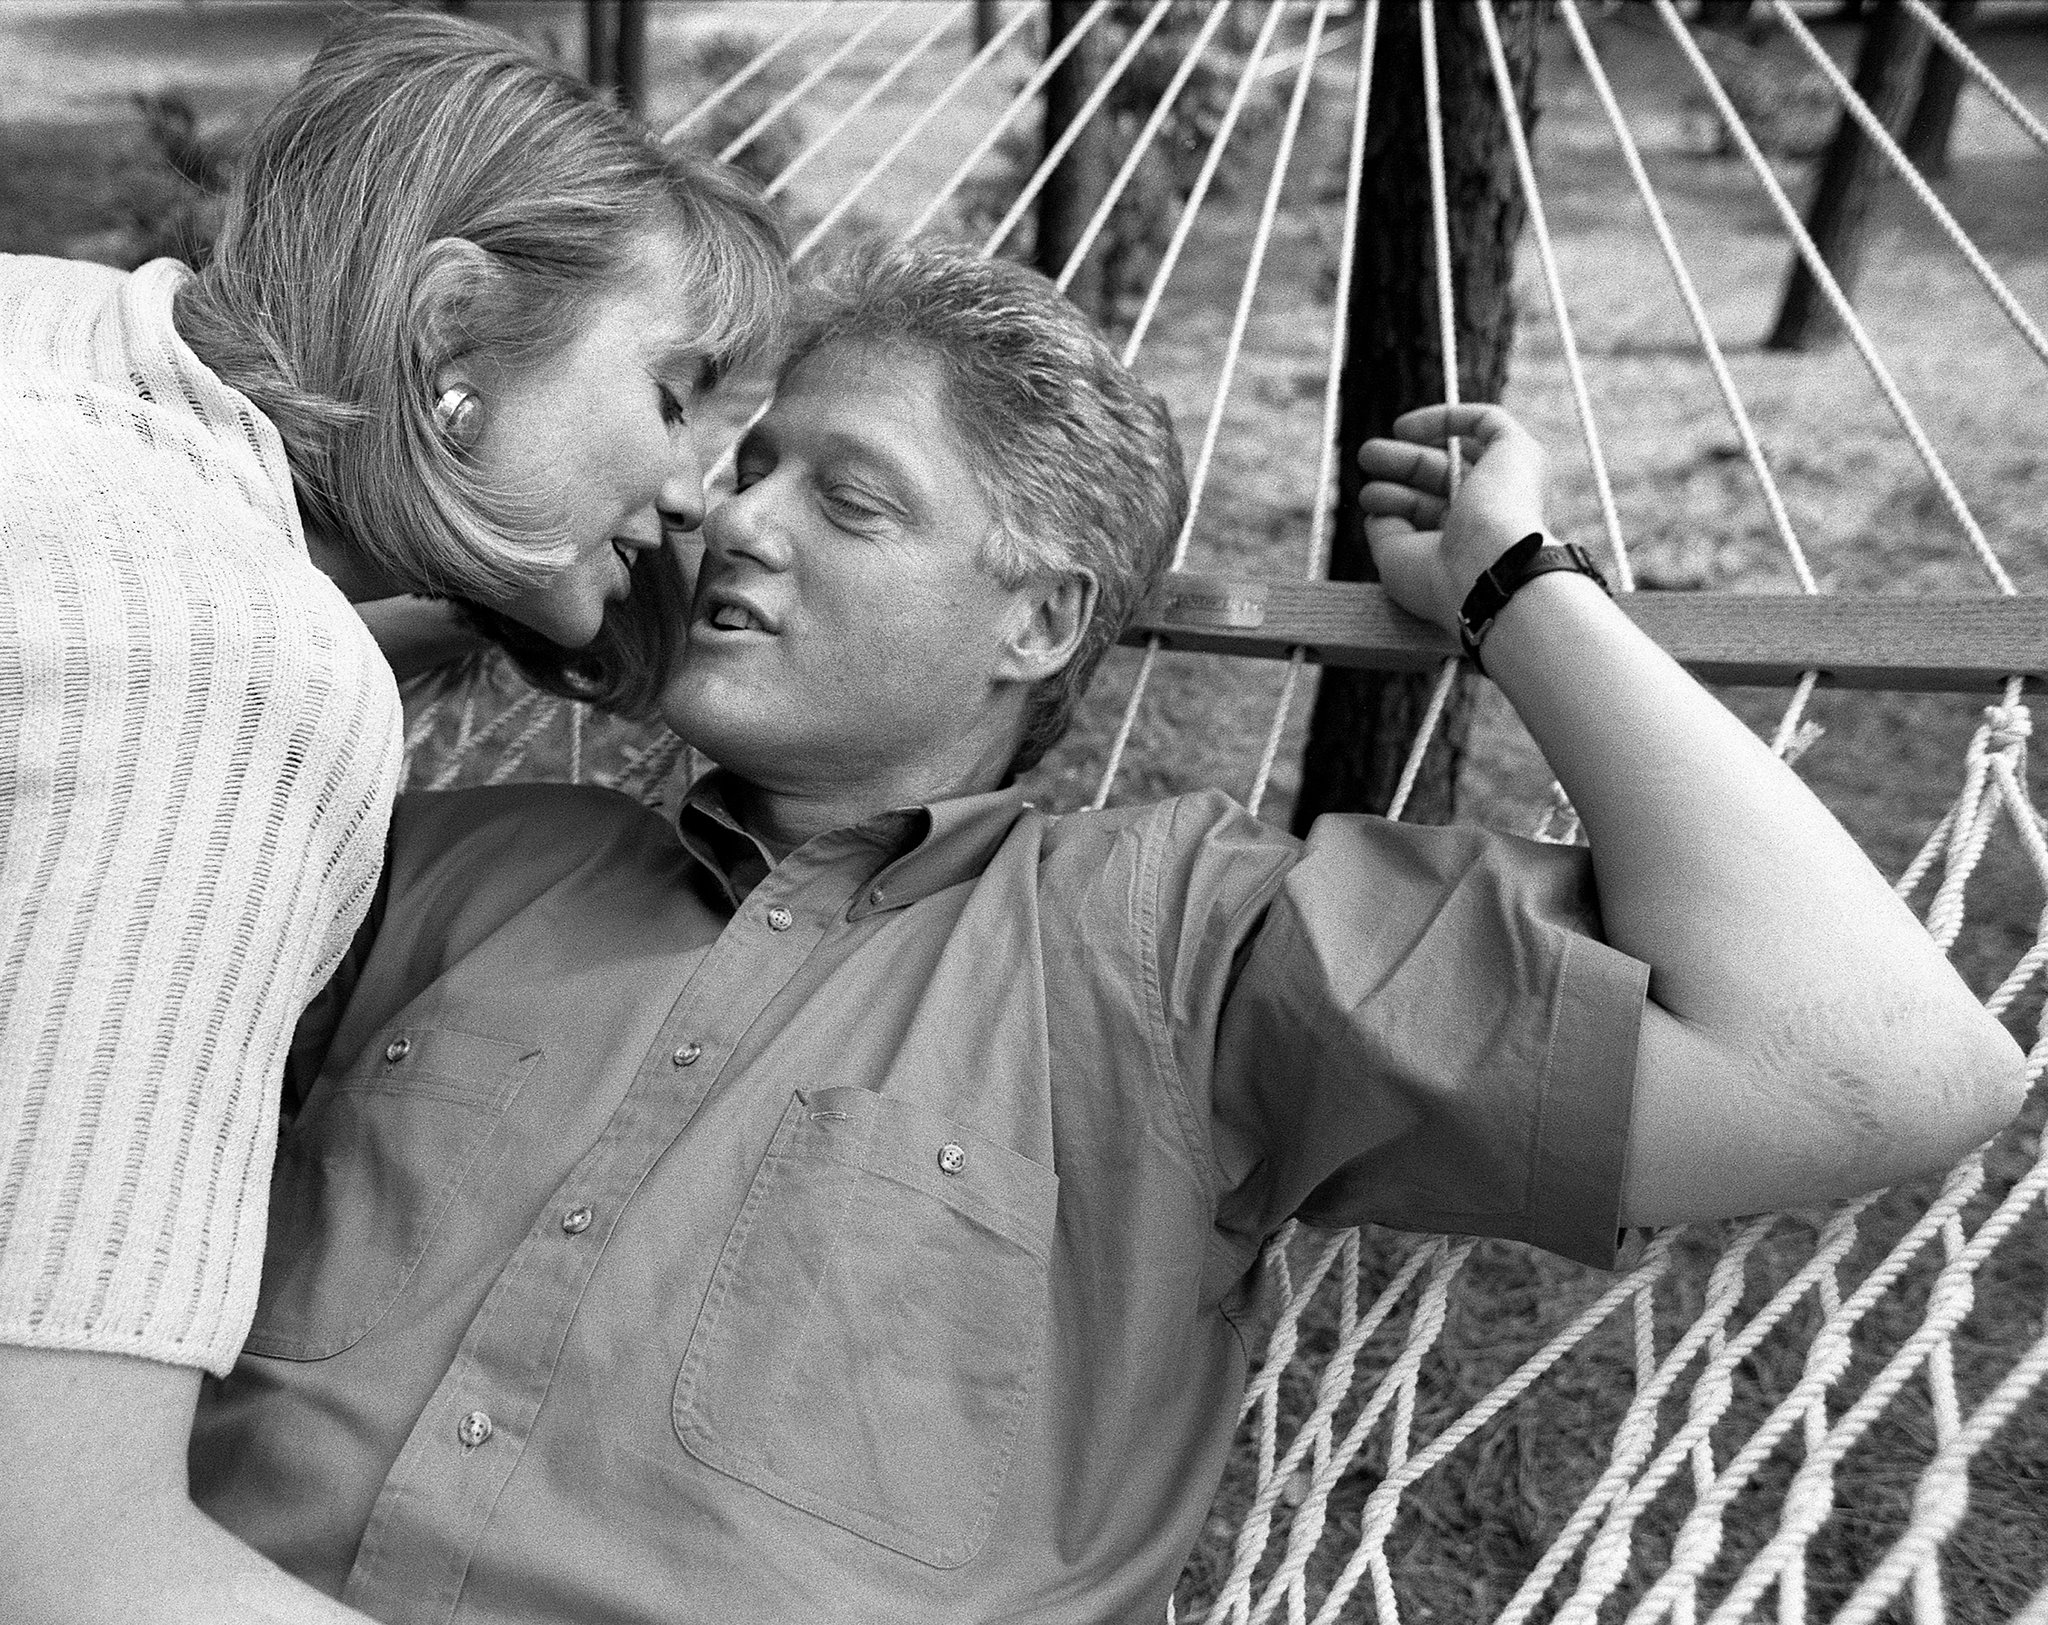 The Secret to Harry Benson's Career of Powerful, Inspiring Photographs